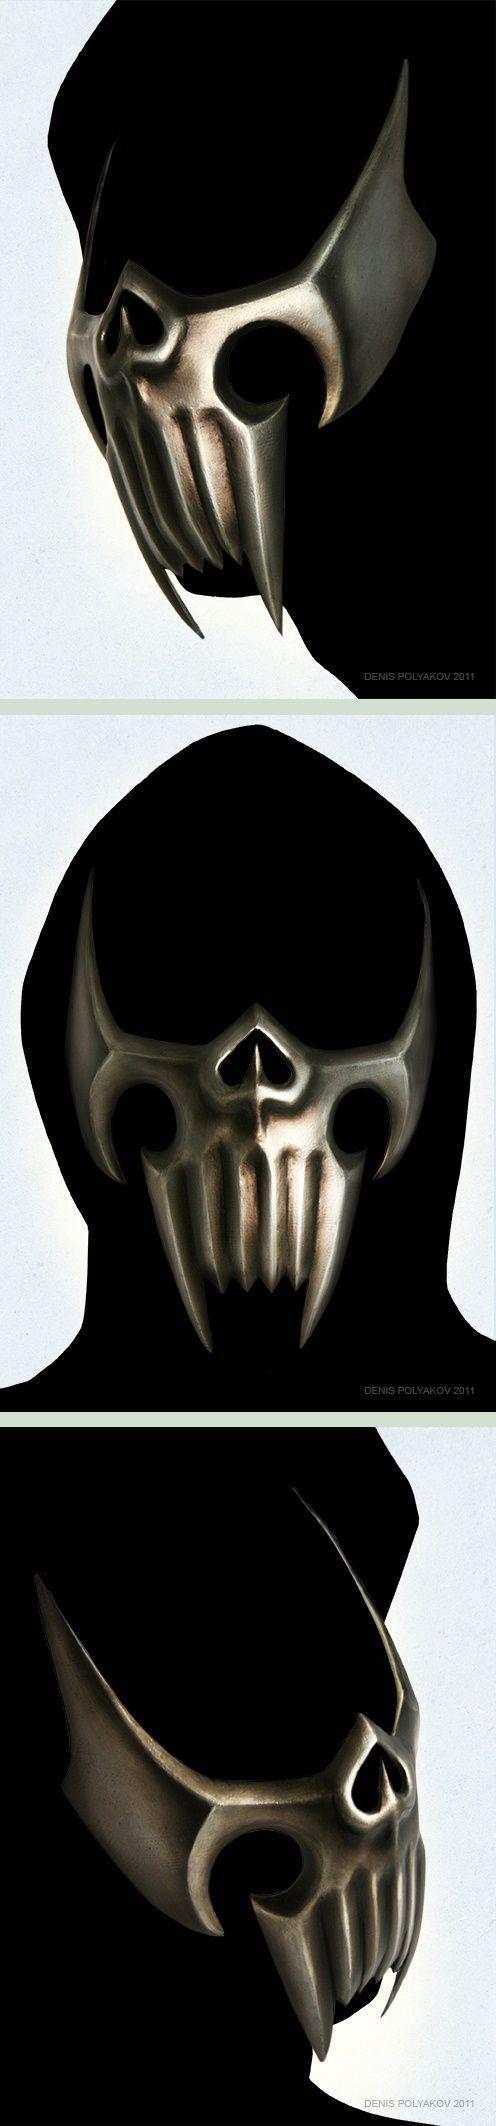 Assassin mask by ~DenisPolyakov on deviantART